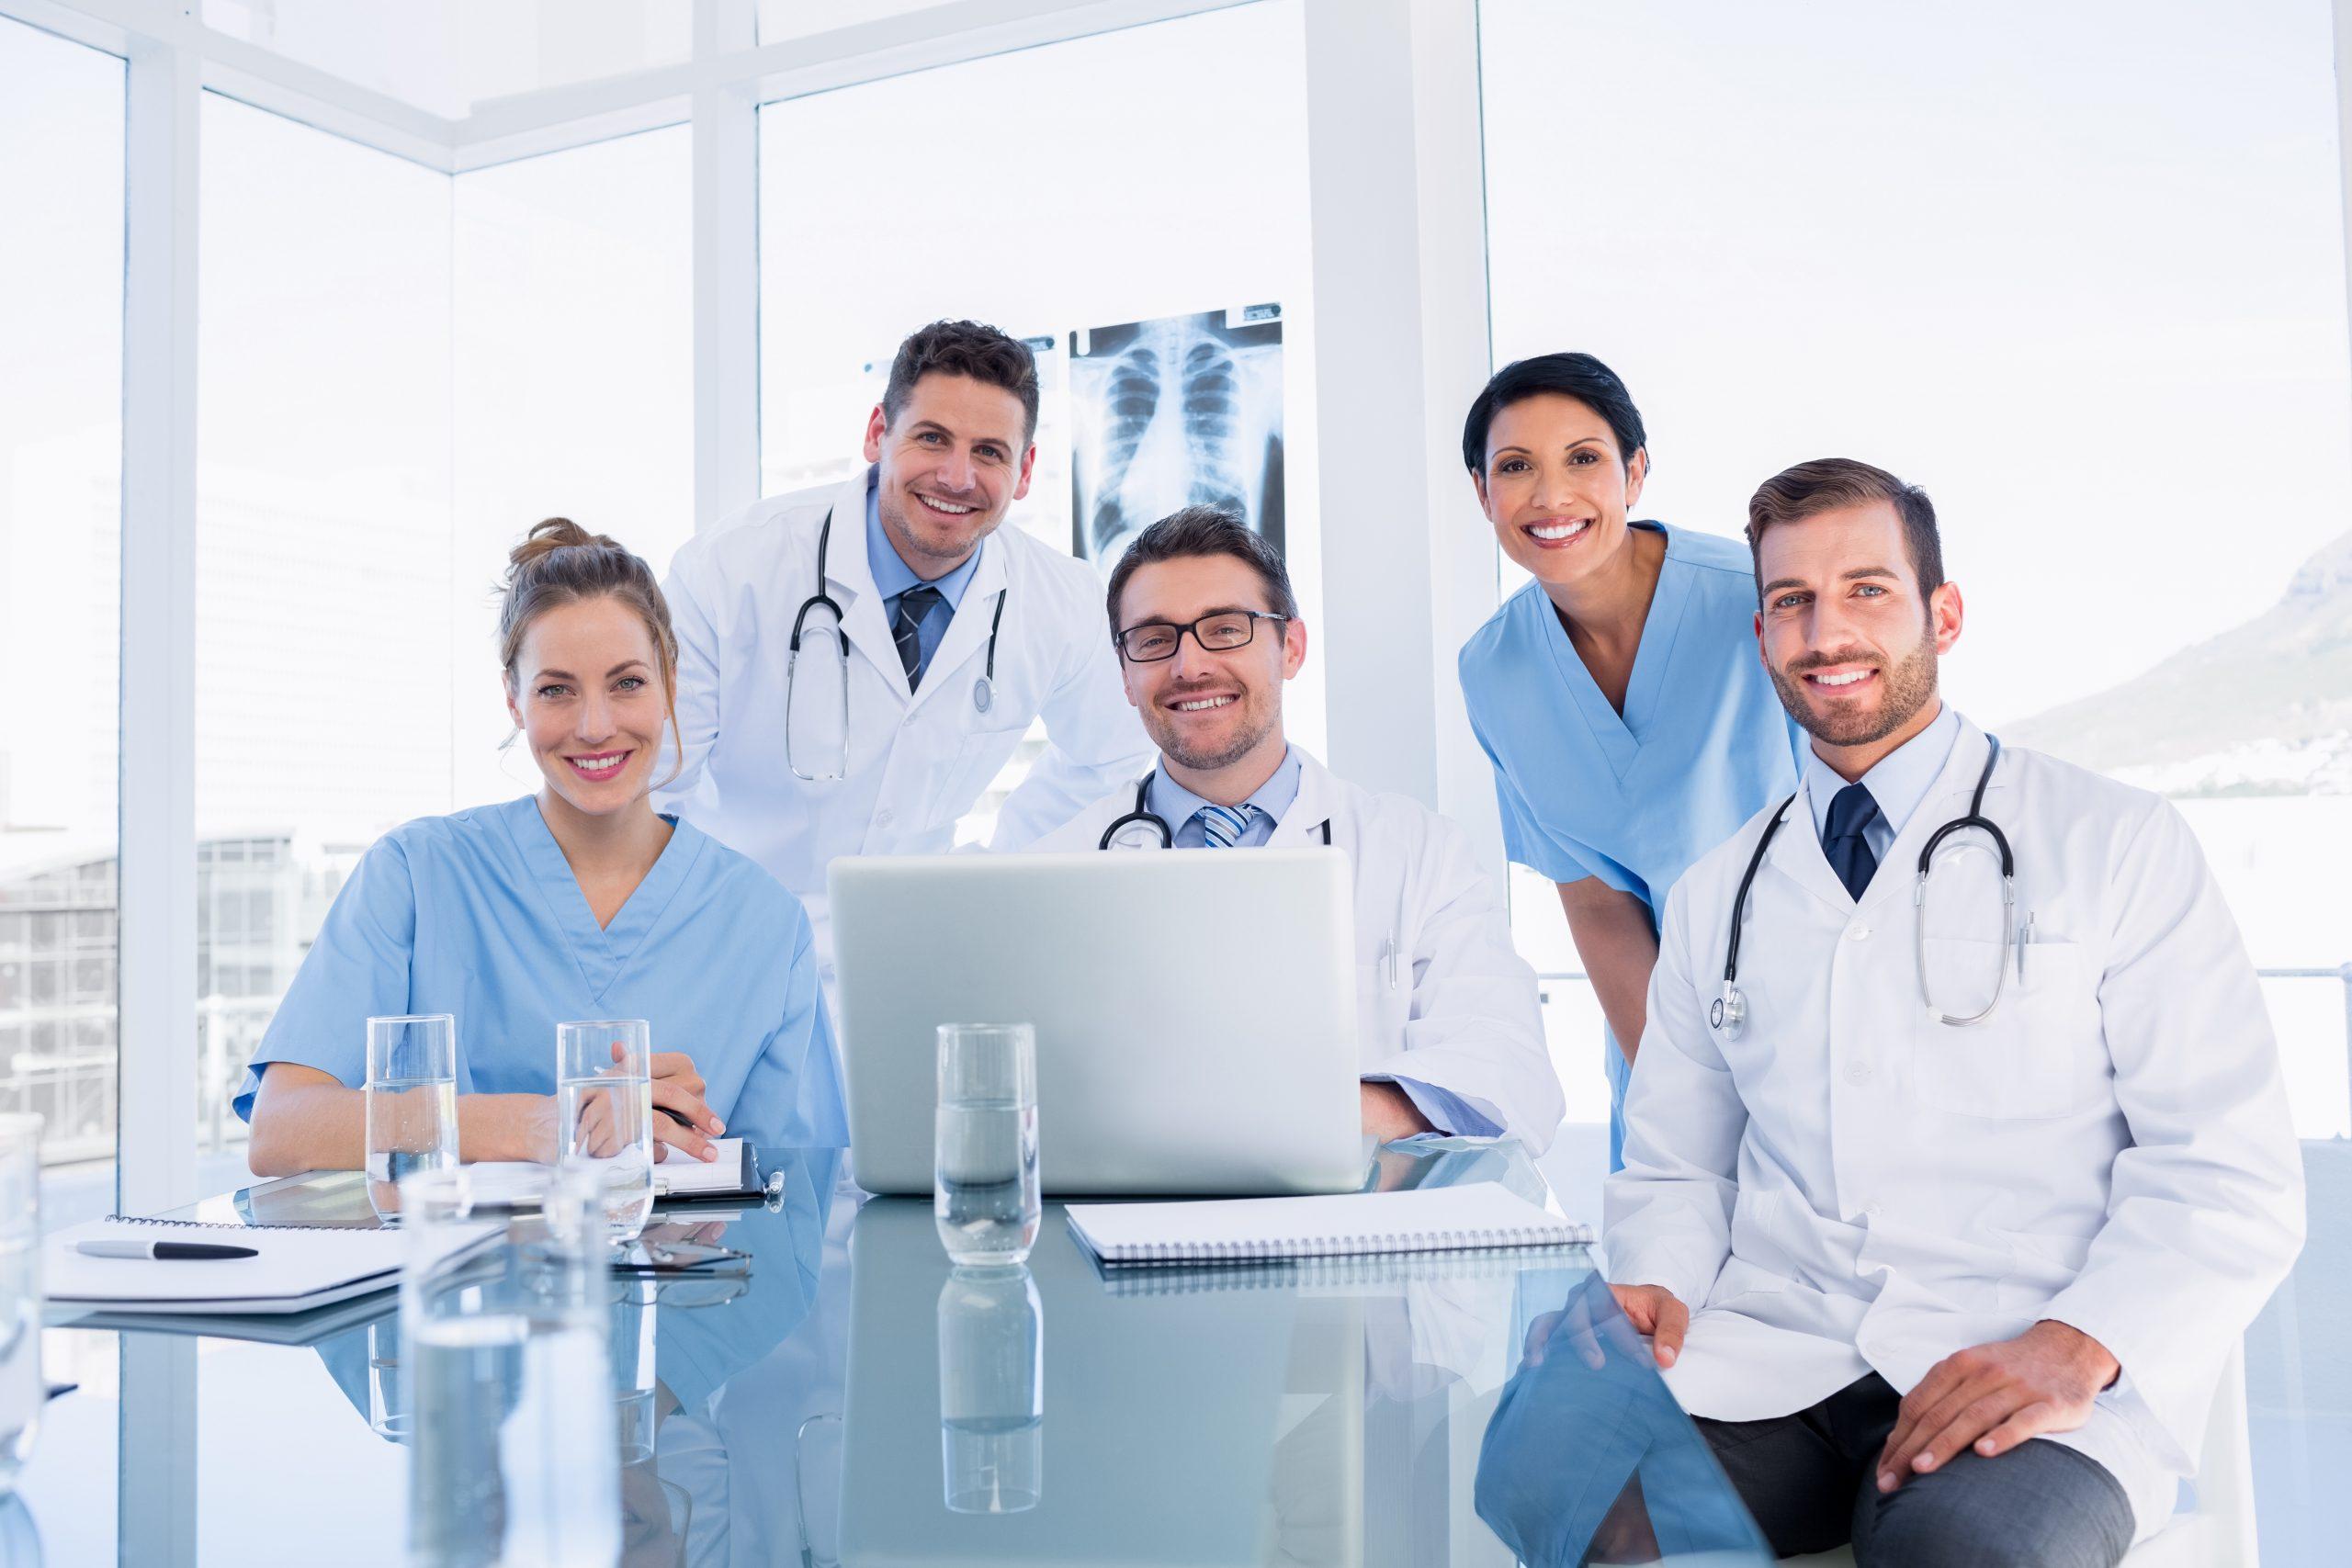 Cirurgia ortopédica em Belo Horizonte - Not Ortopedia